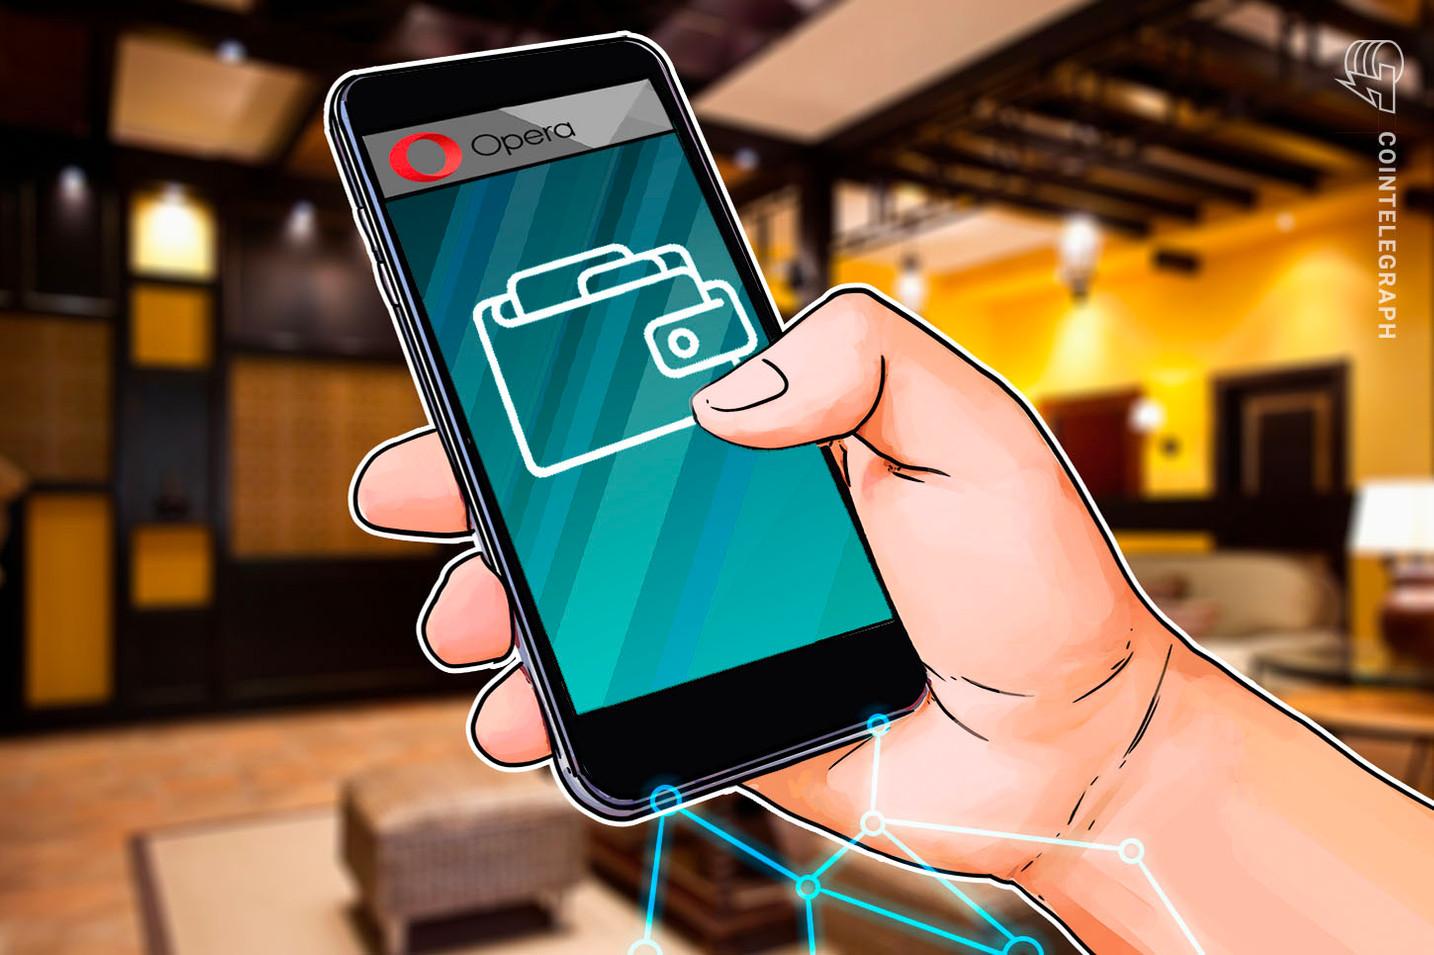 Opera expande la recarga de billeteras cripto al Reino Unido